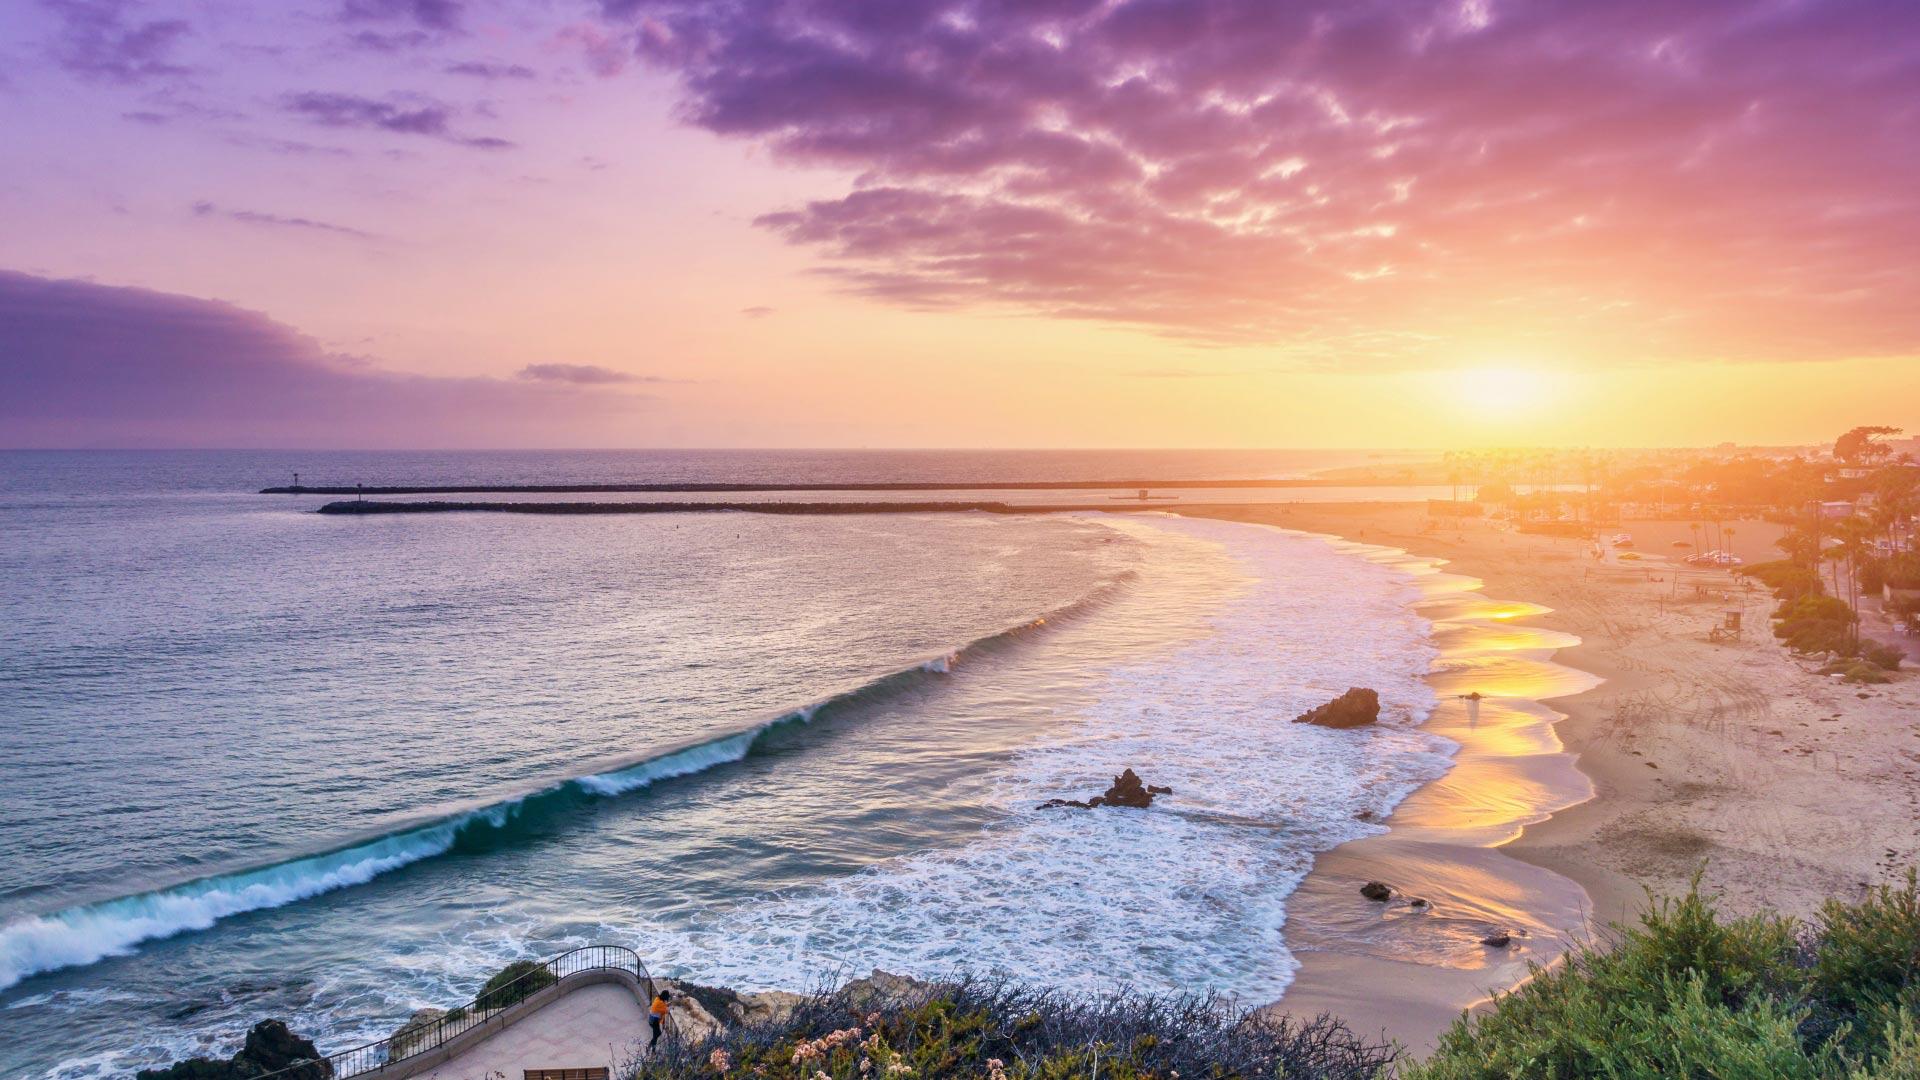 Papel De Parede Praia Maravilhosa